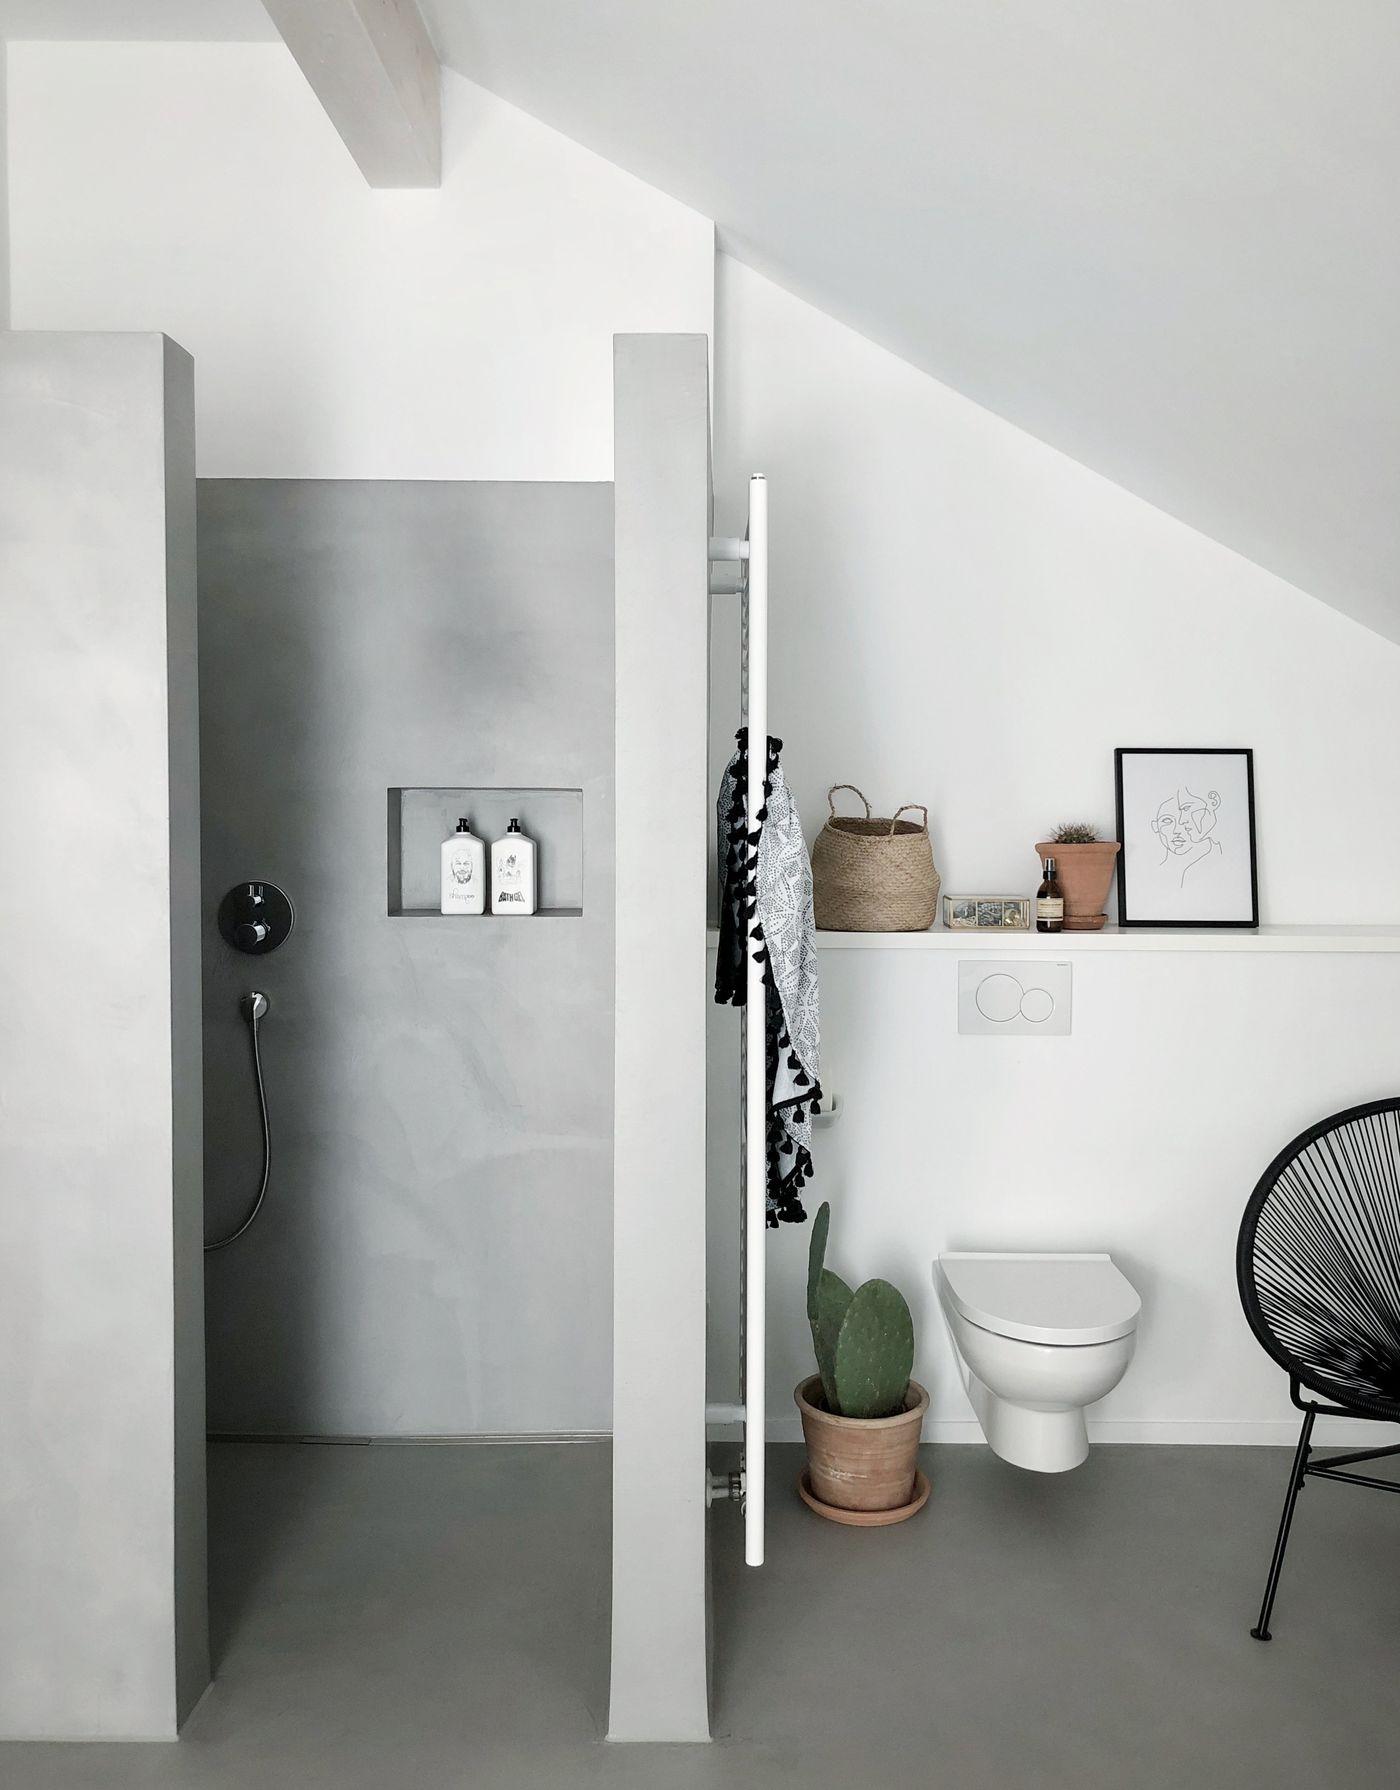 Beton cir tolle ideen mit dem effektputz in betonoptik - Tolle badezimmer ideen ...